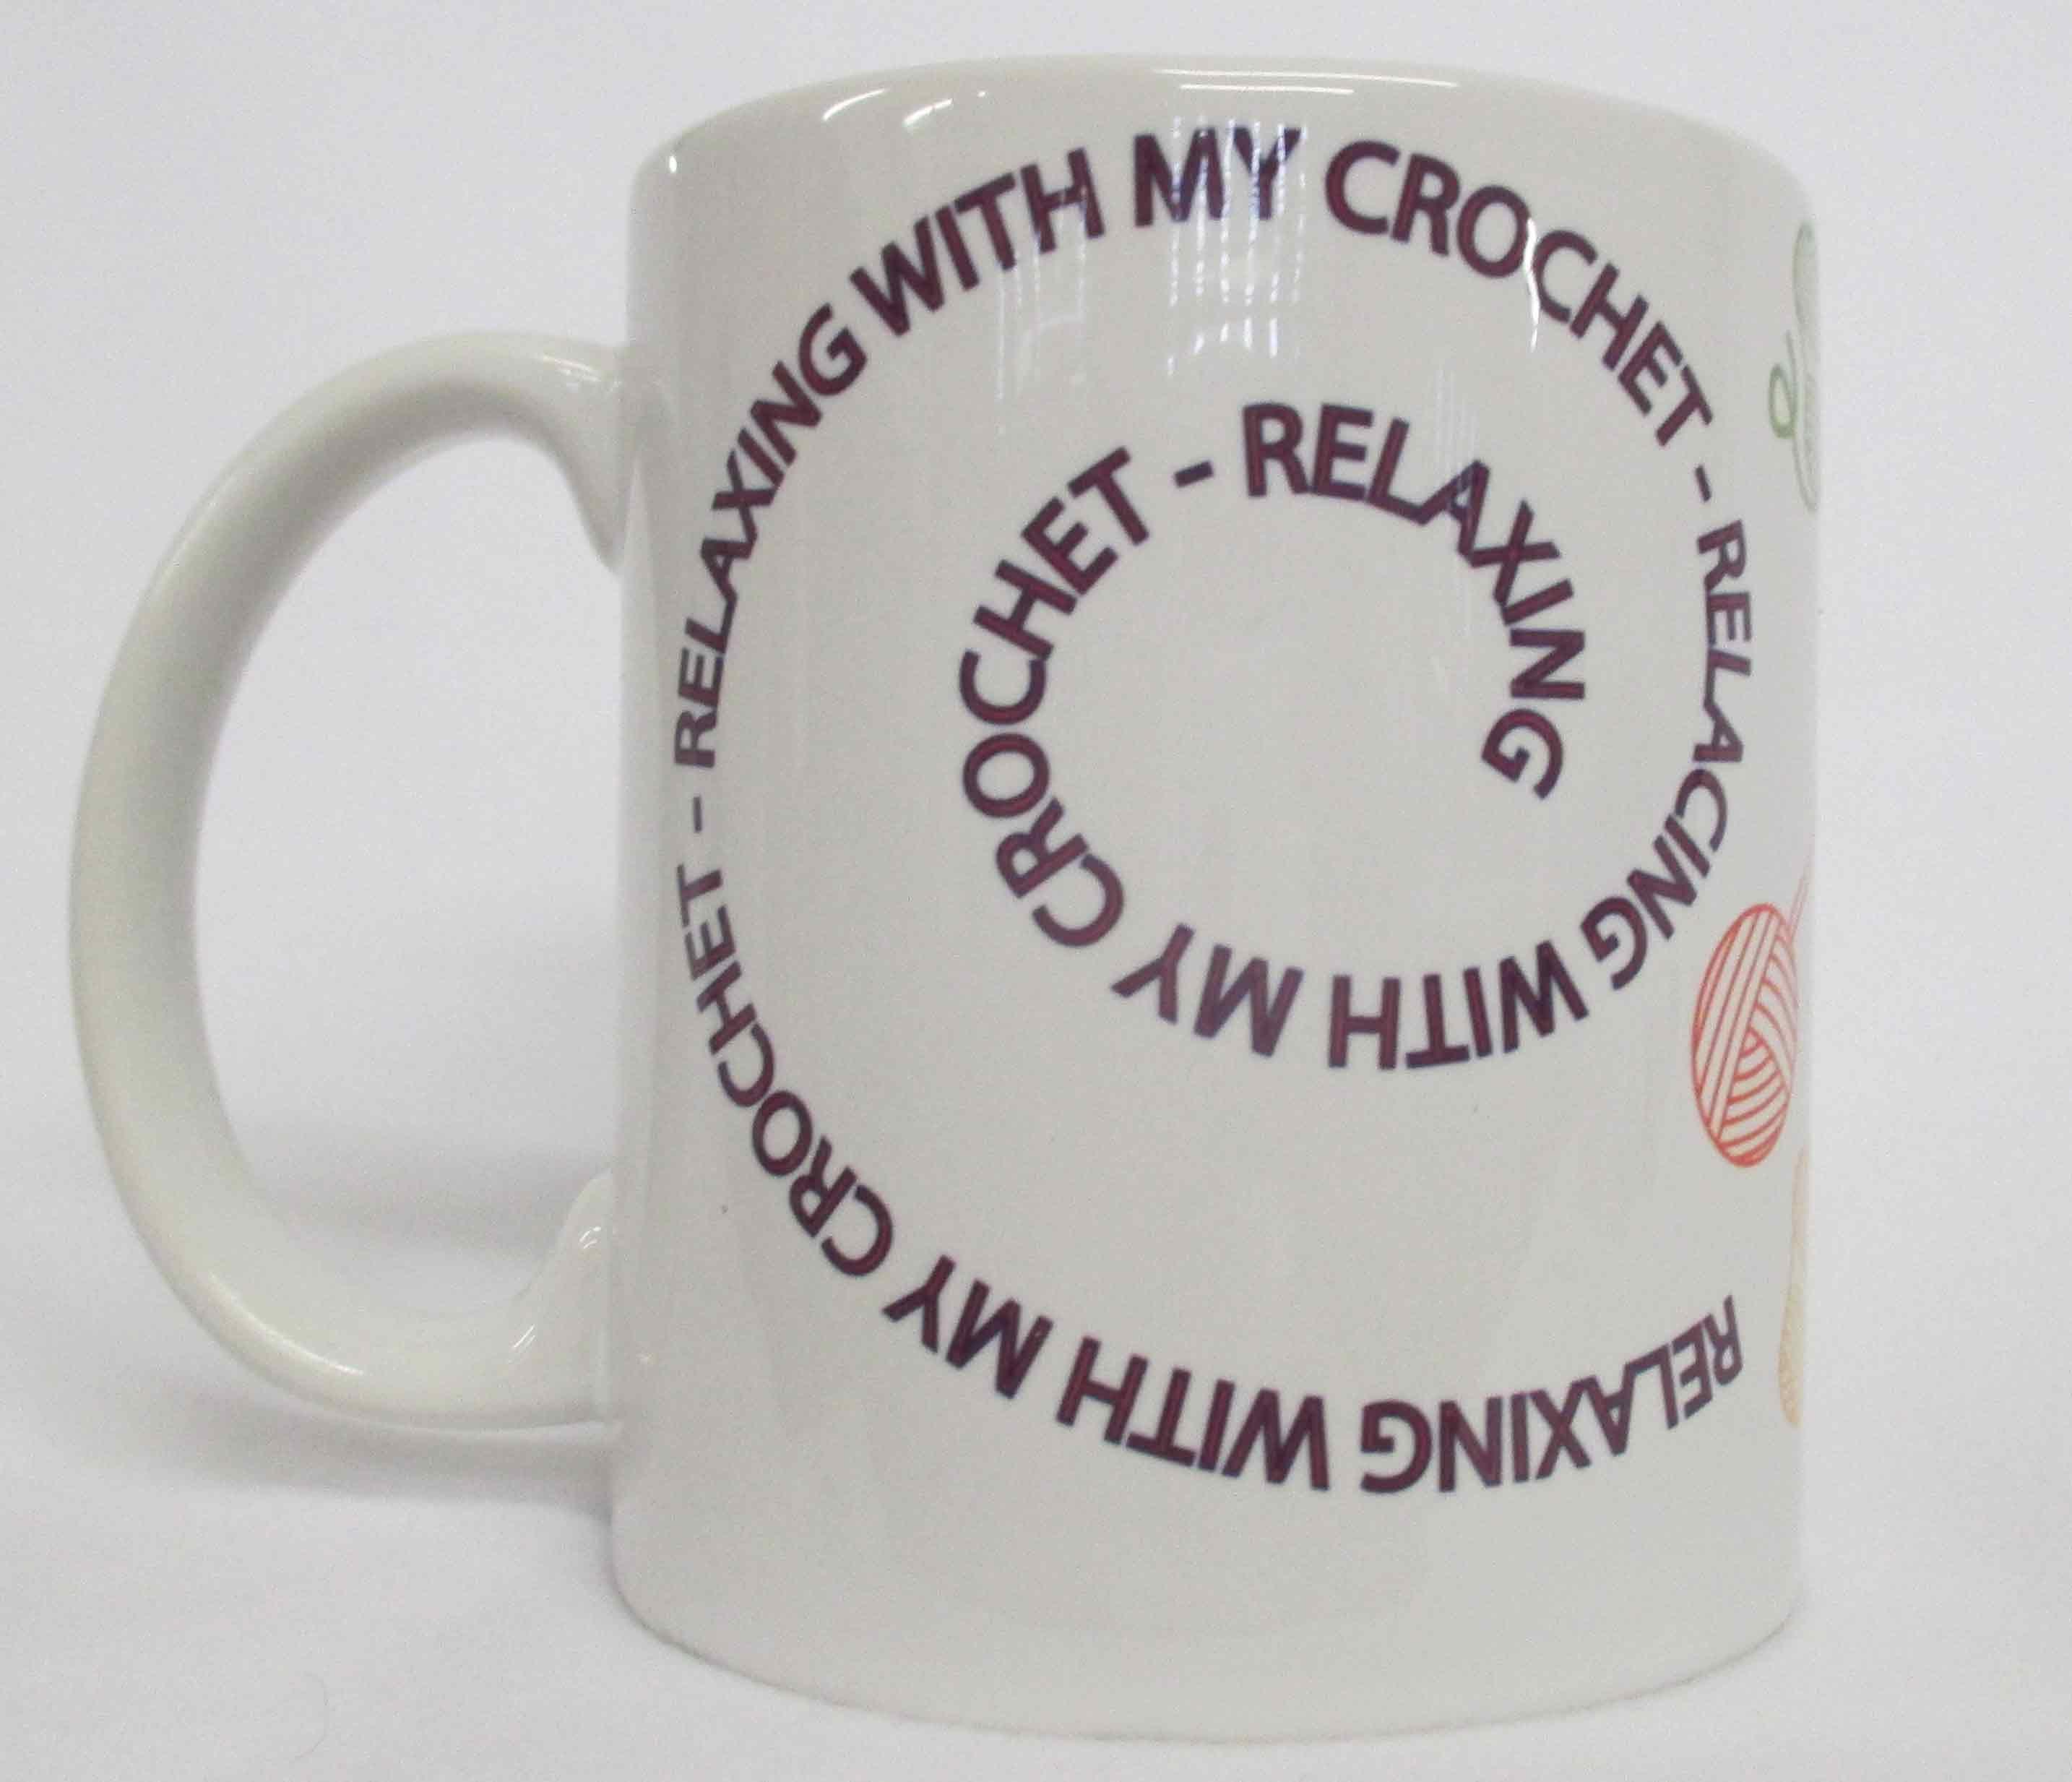 Crochet-mug-1a-webphoto